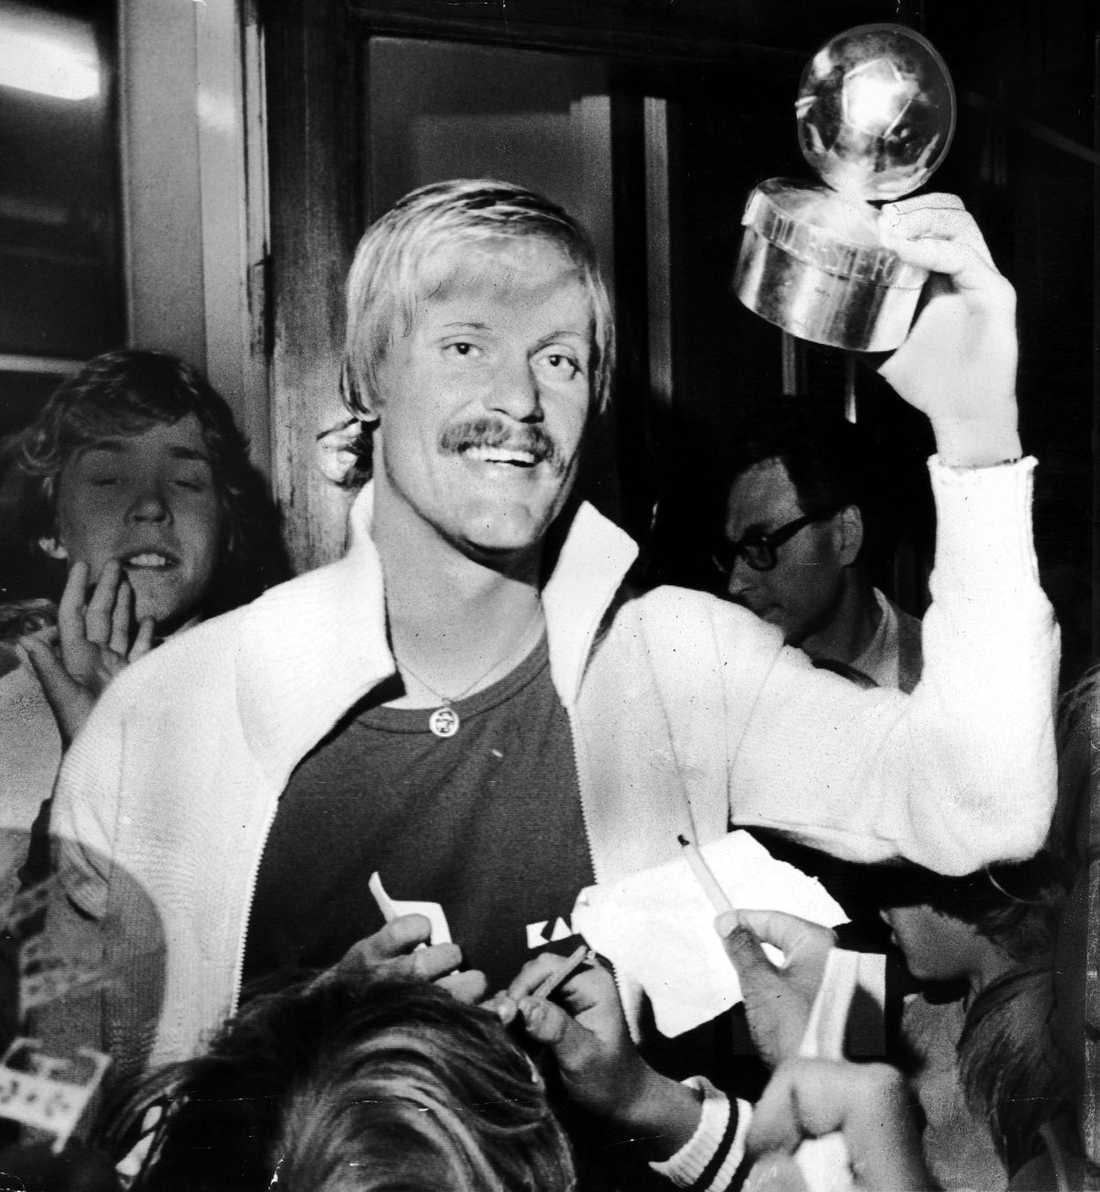 1978: Ronnie Hellström, Kaiserslautern